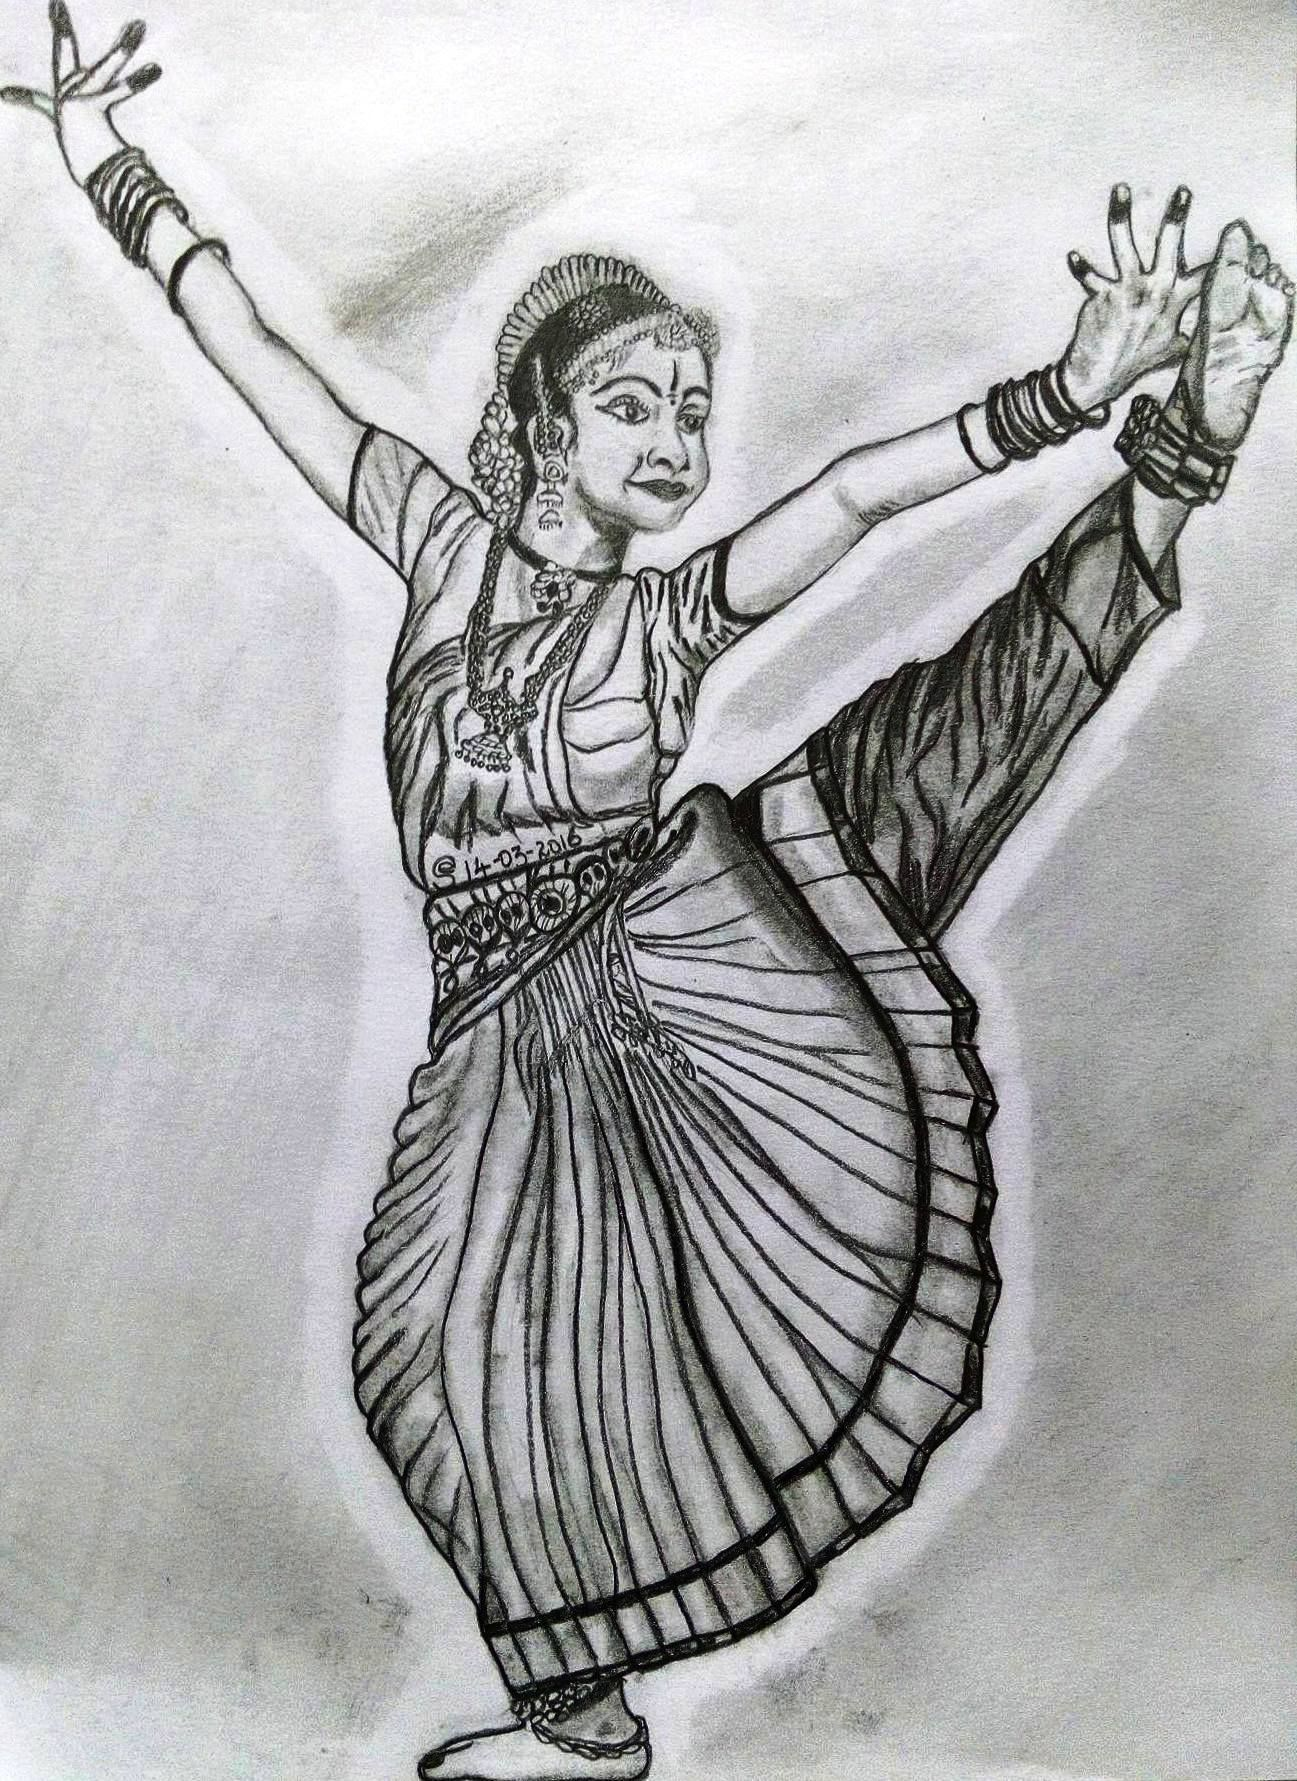 Http Rakshearts Blogspot In 2016 03 Original Drawing For Sale Bharatanatyam Html Drawings Original Drawing Easy Drawings